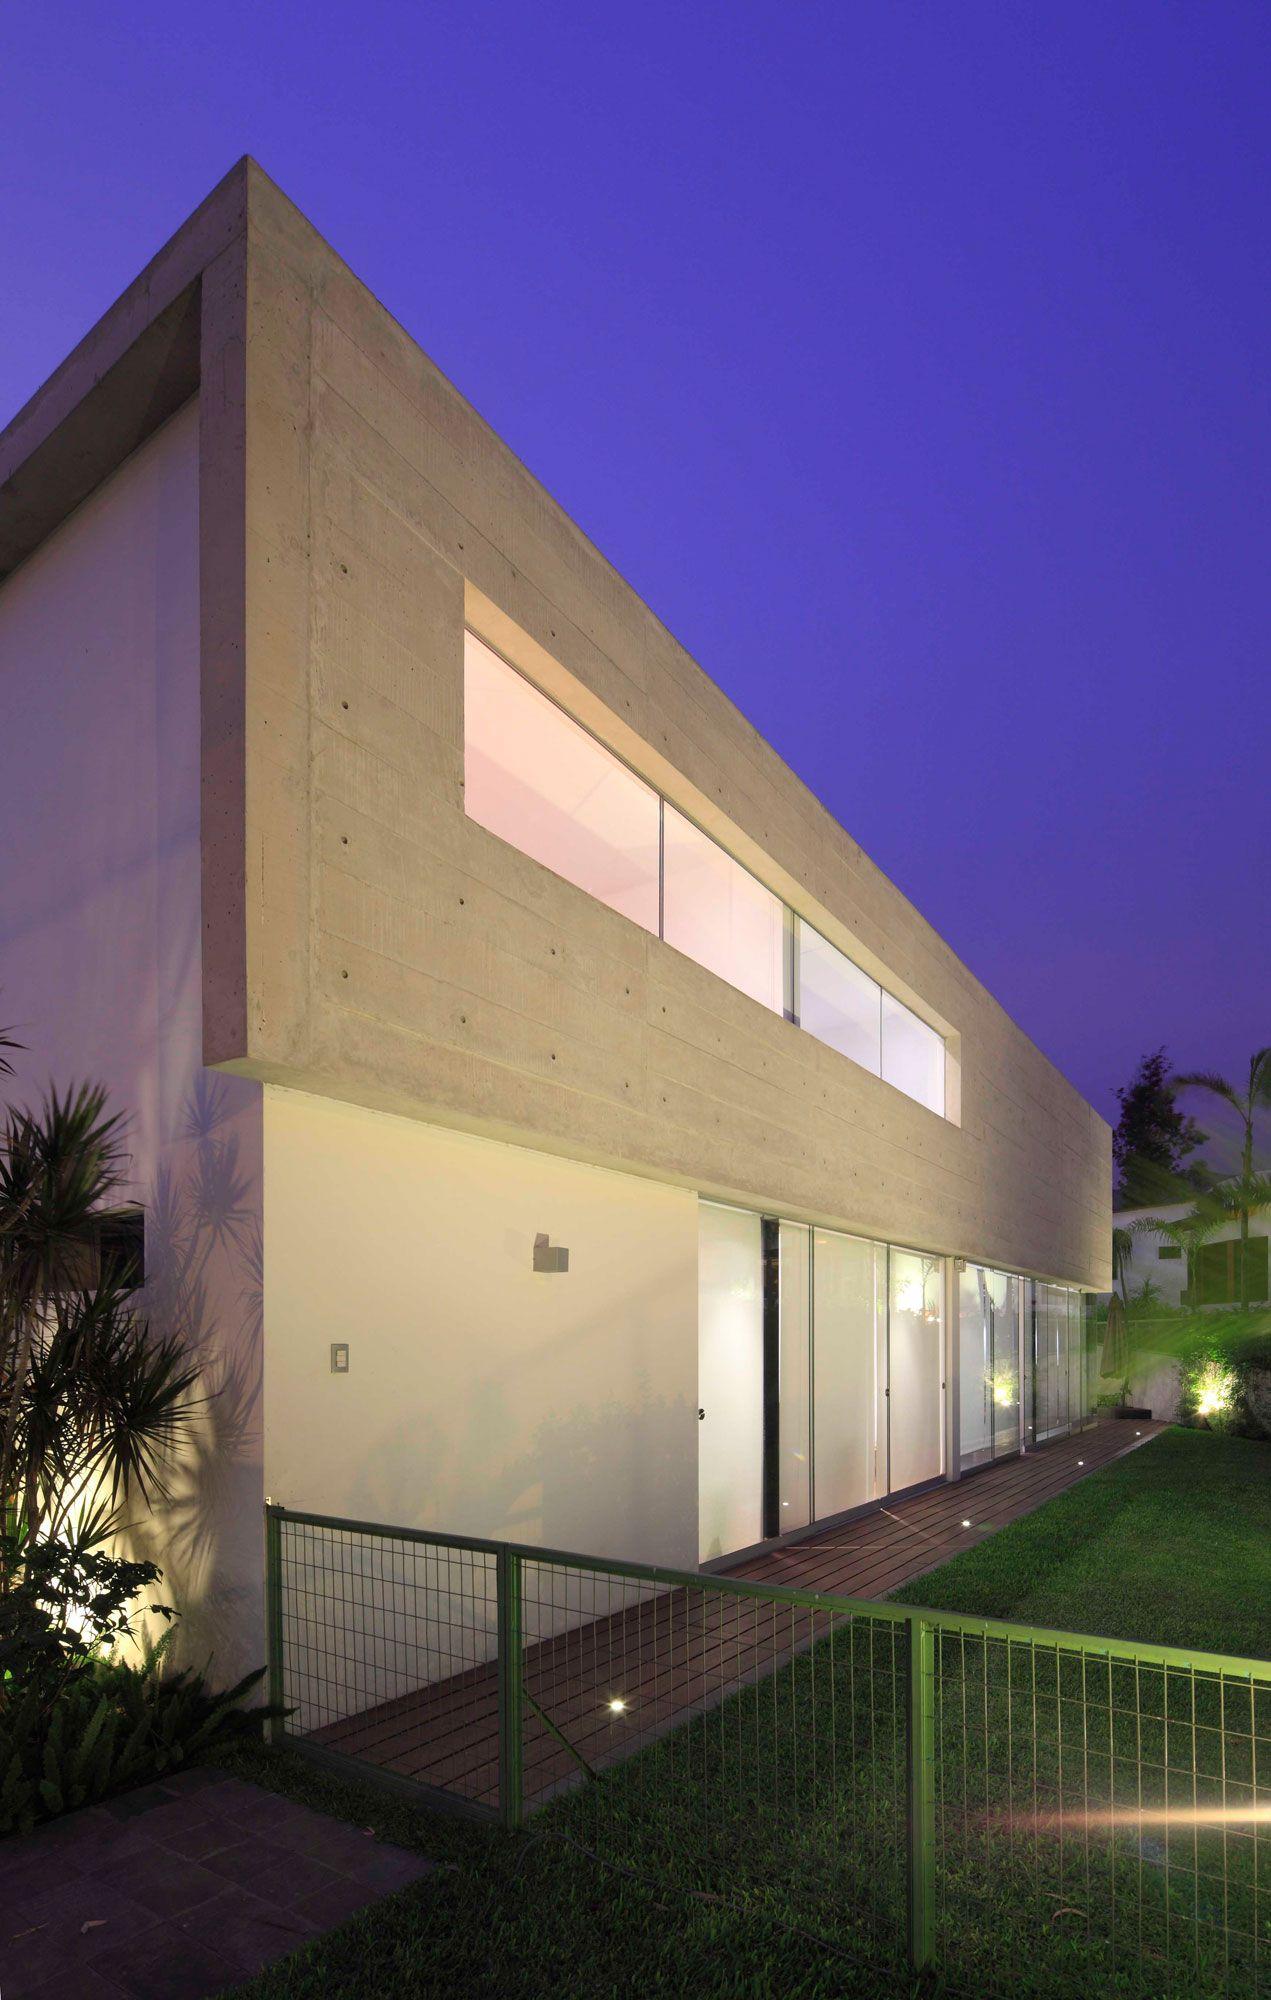 House-in-La-Planicie-07